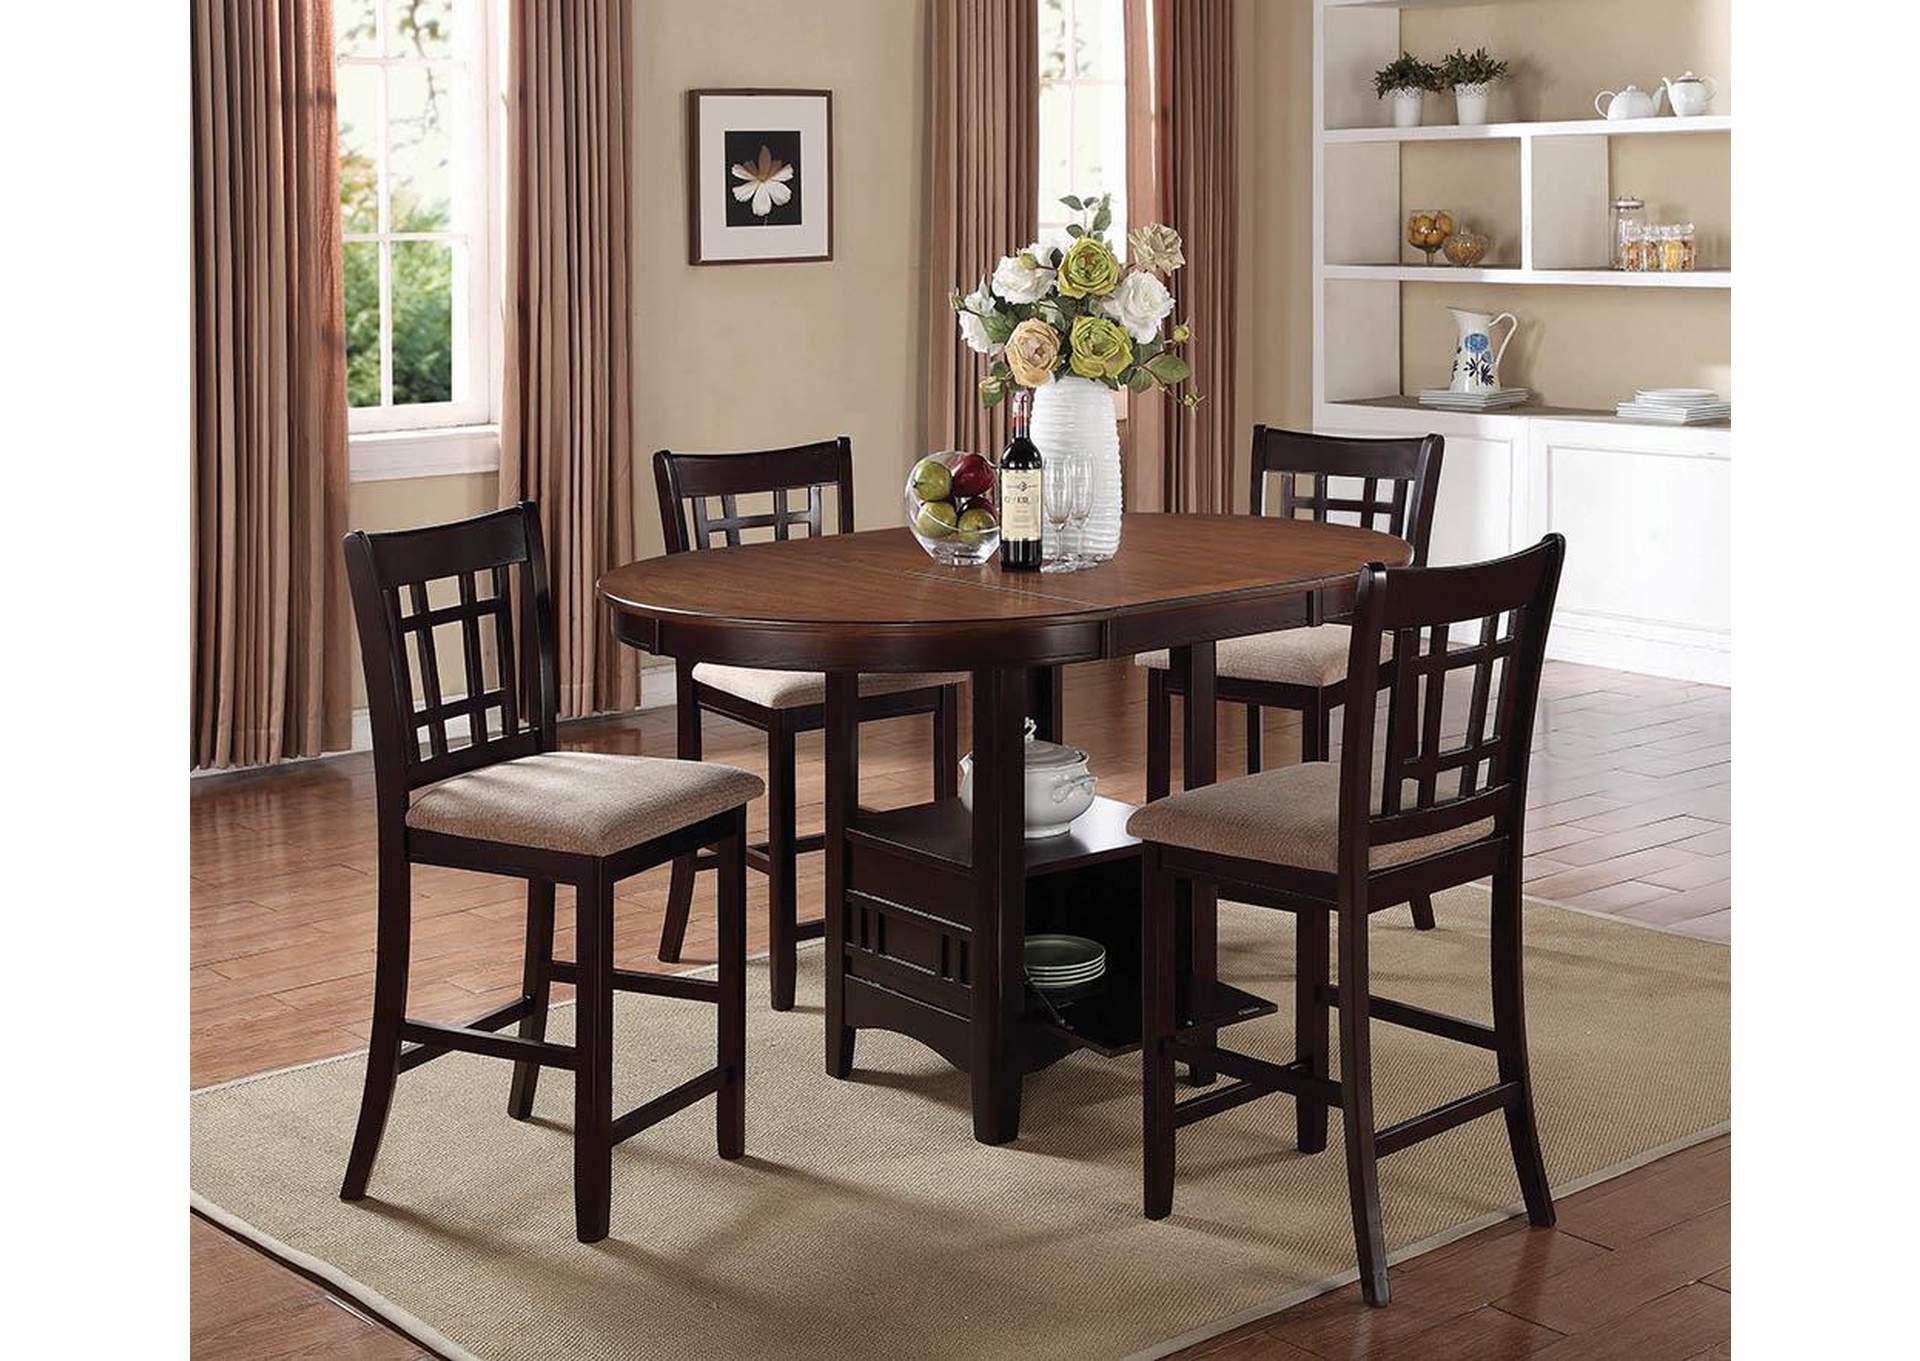 Super American Furniture Al Lavon Light Oak And Espresso Counter Alphanode Cool Chair Designs And Ideas Alphanodeonline